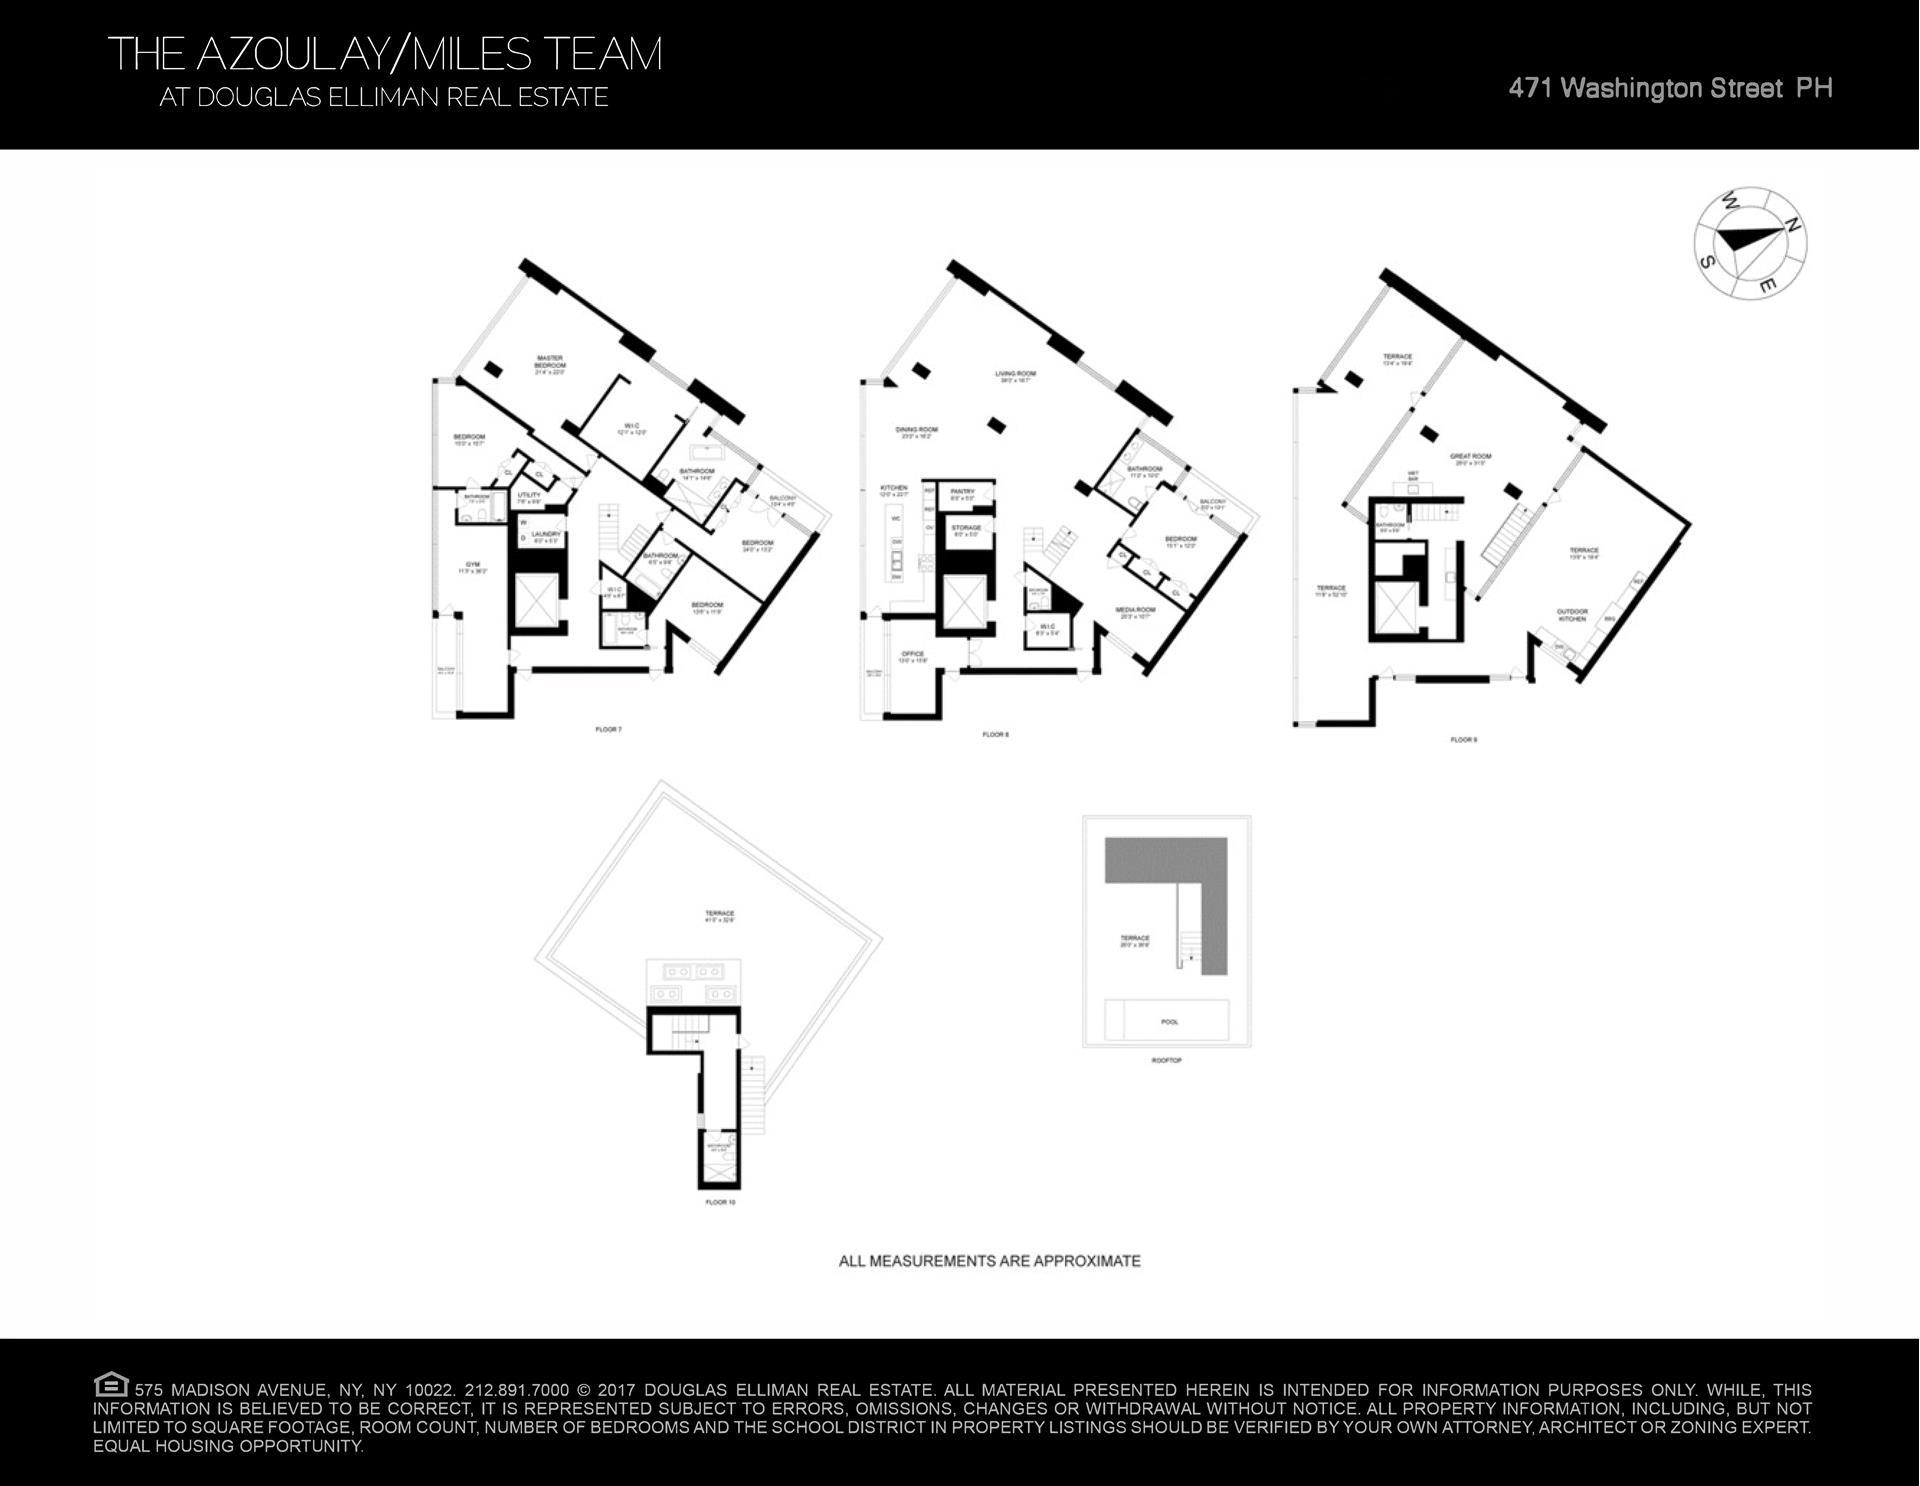 Floor plan of 471 Washington St, PH/7THFLR - TriBeCa, New York